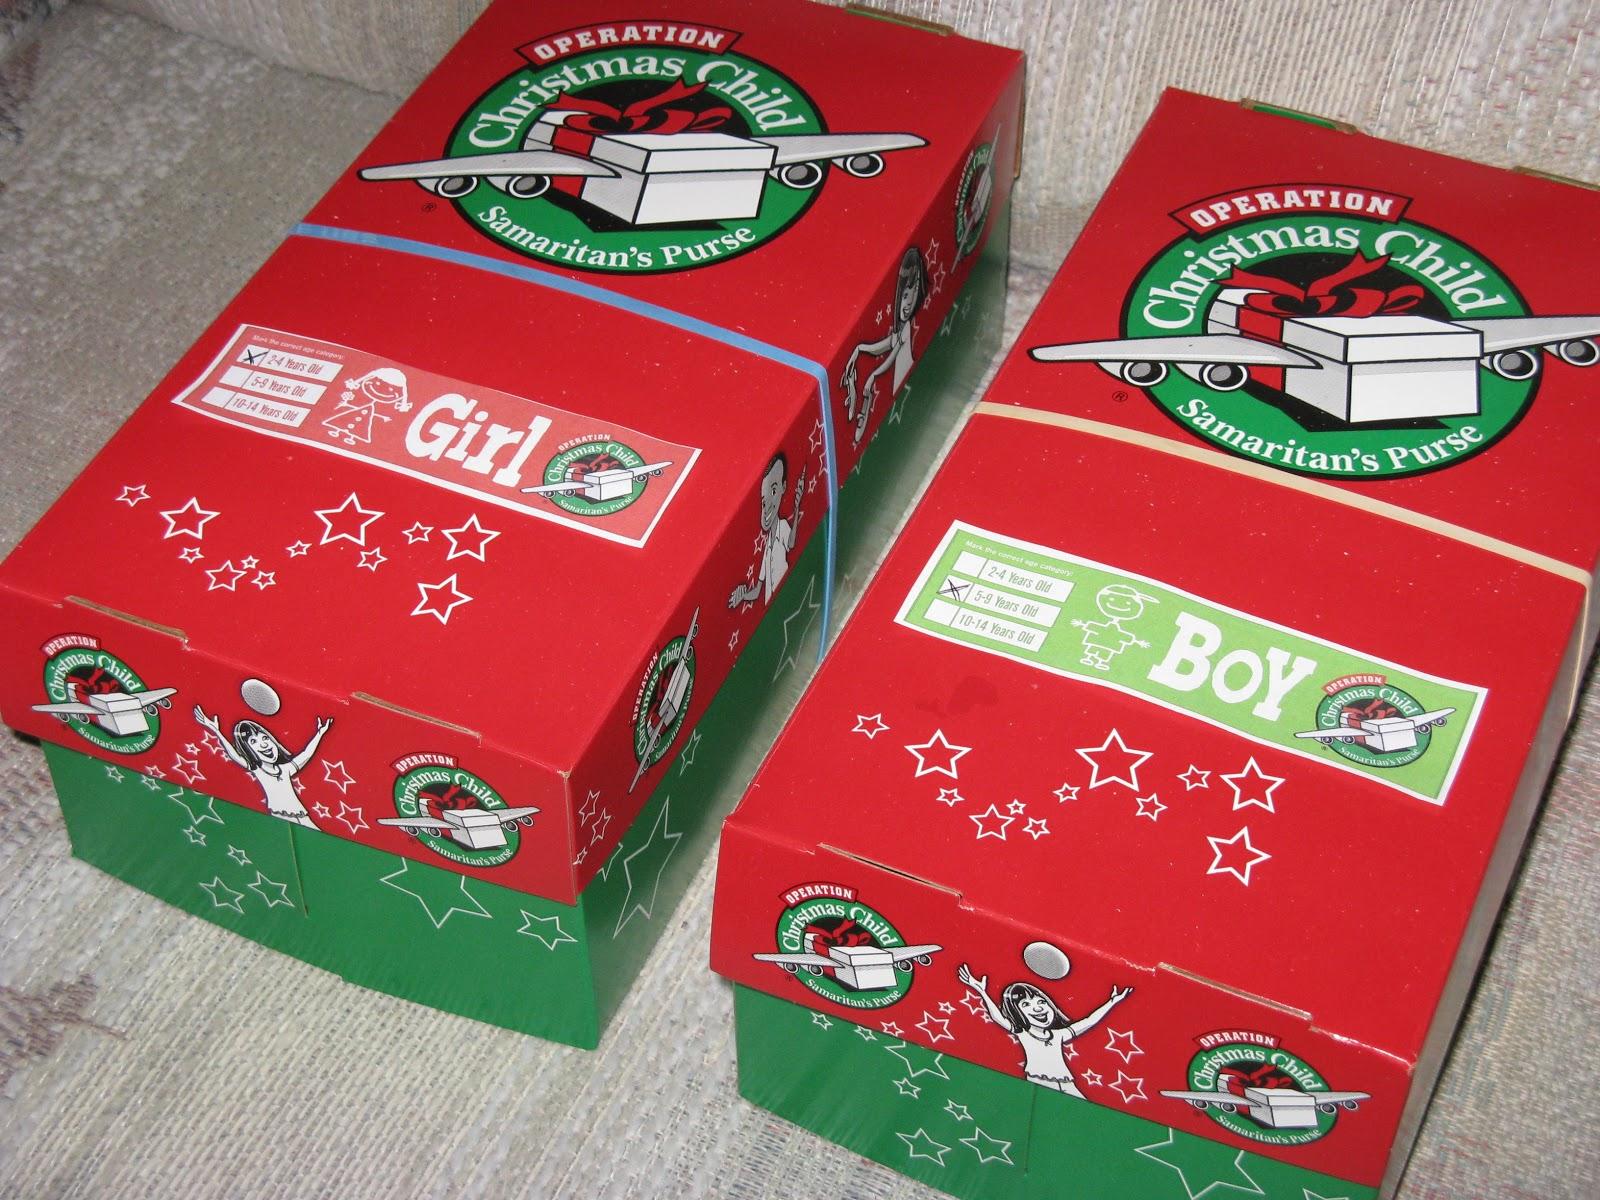 Operation Christmas Child 2015 - Trade Distribution Ltd